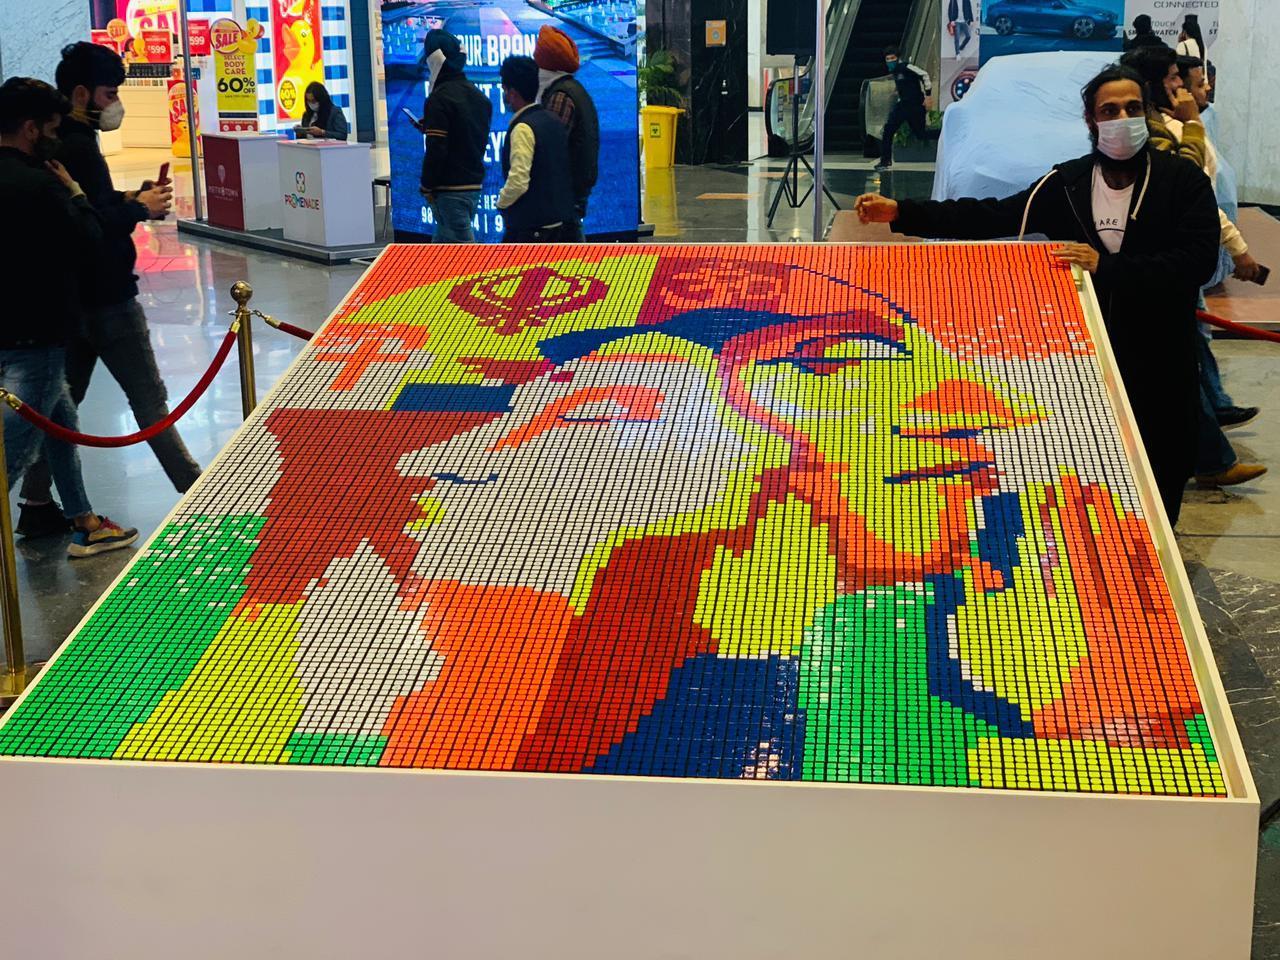 Republic Day Art Work at Elante Mall by Artist Barkat Singh